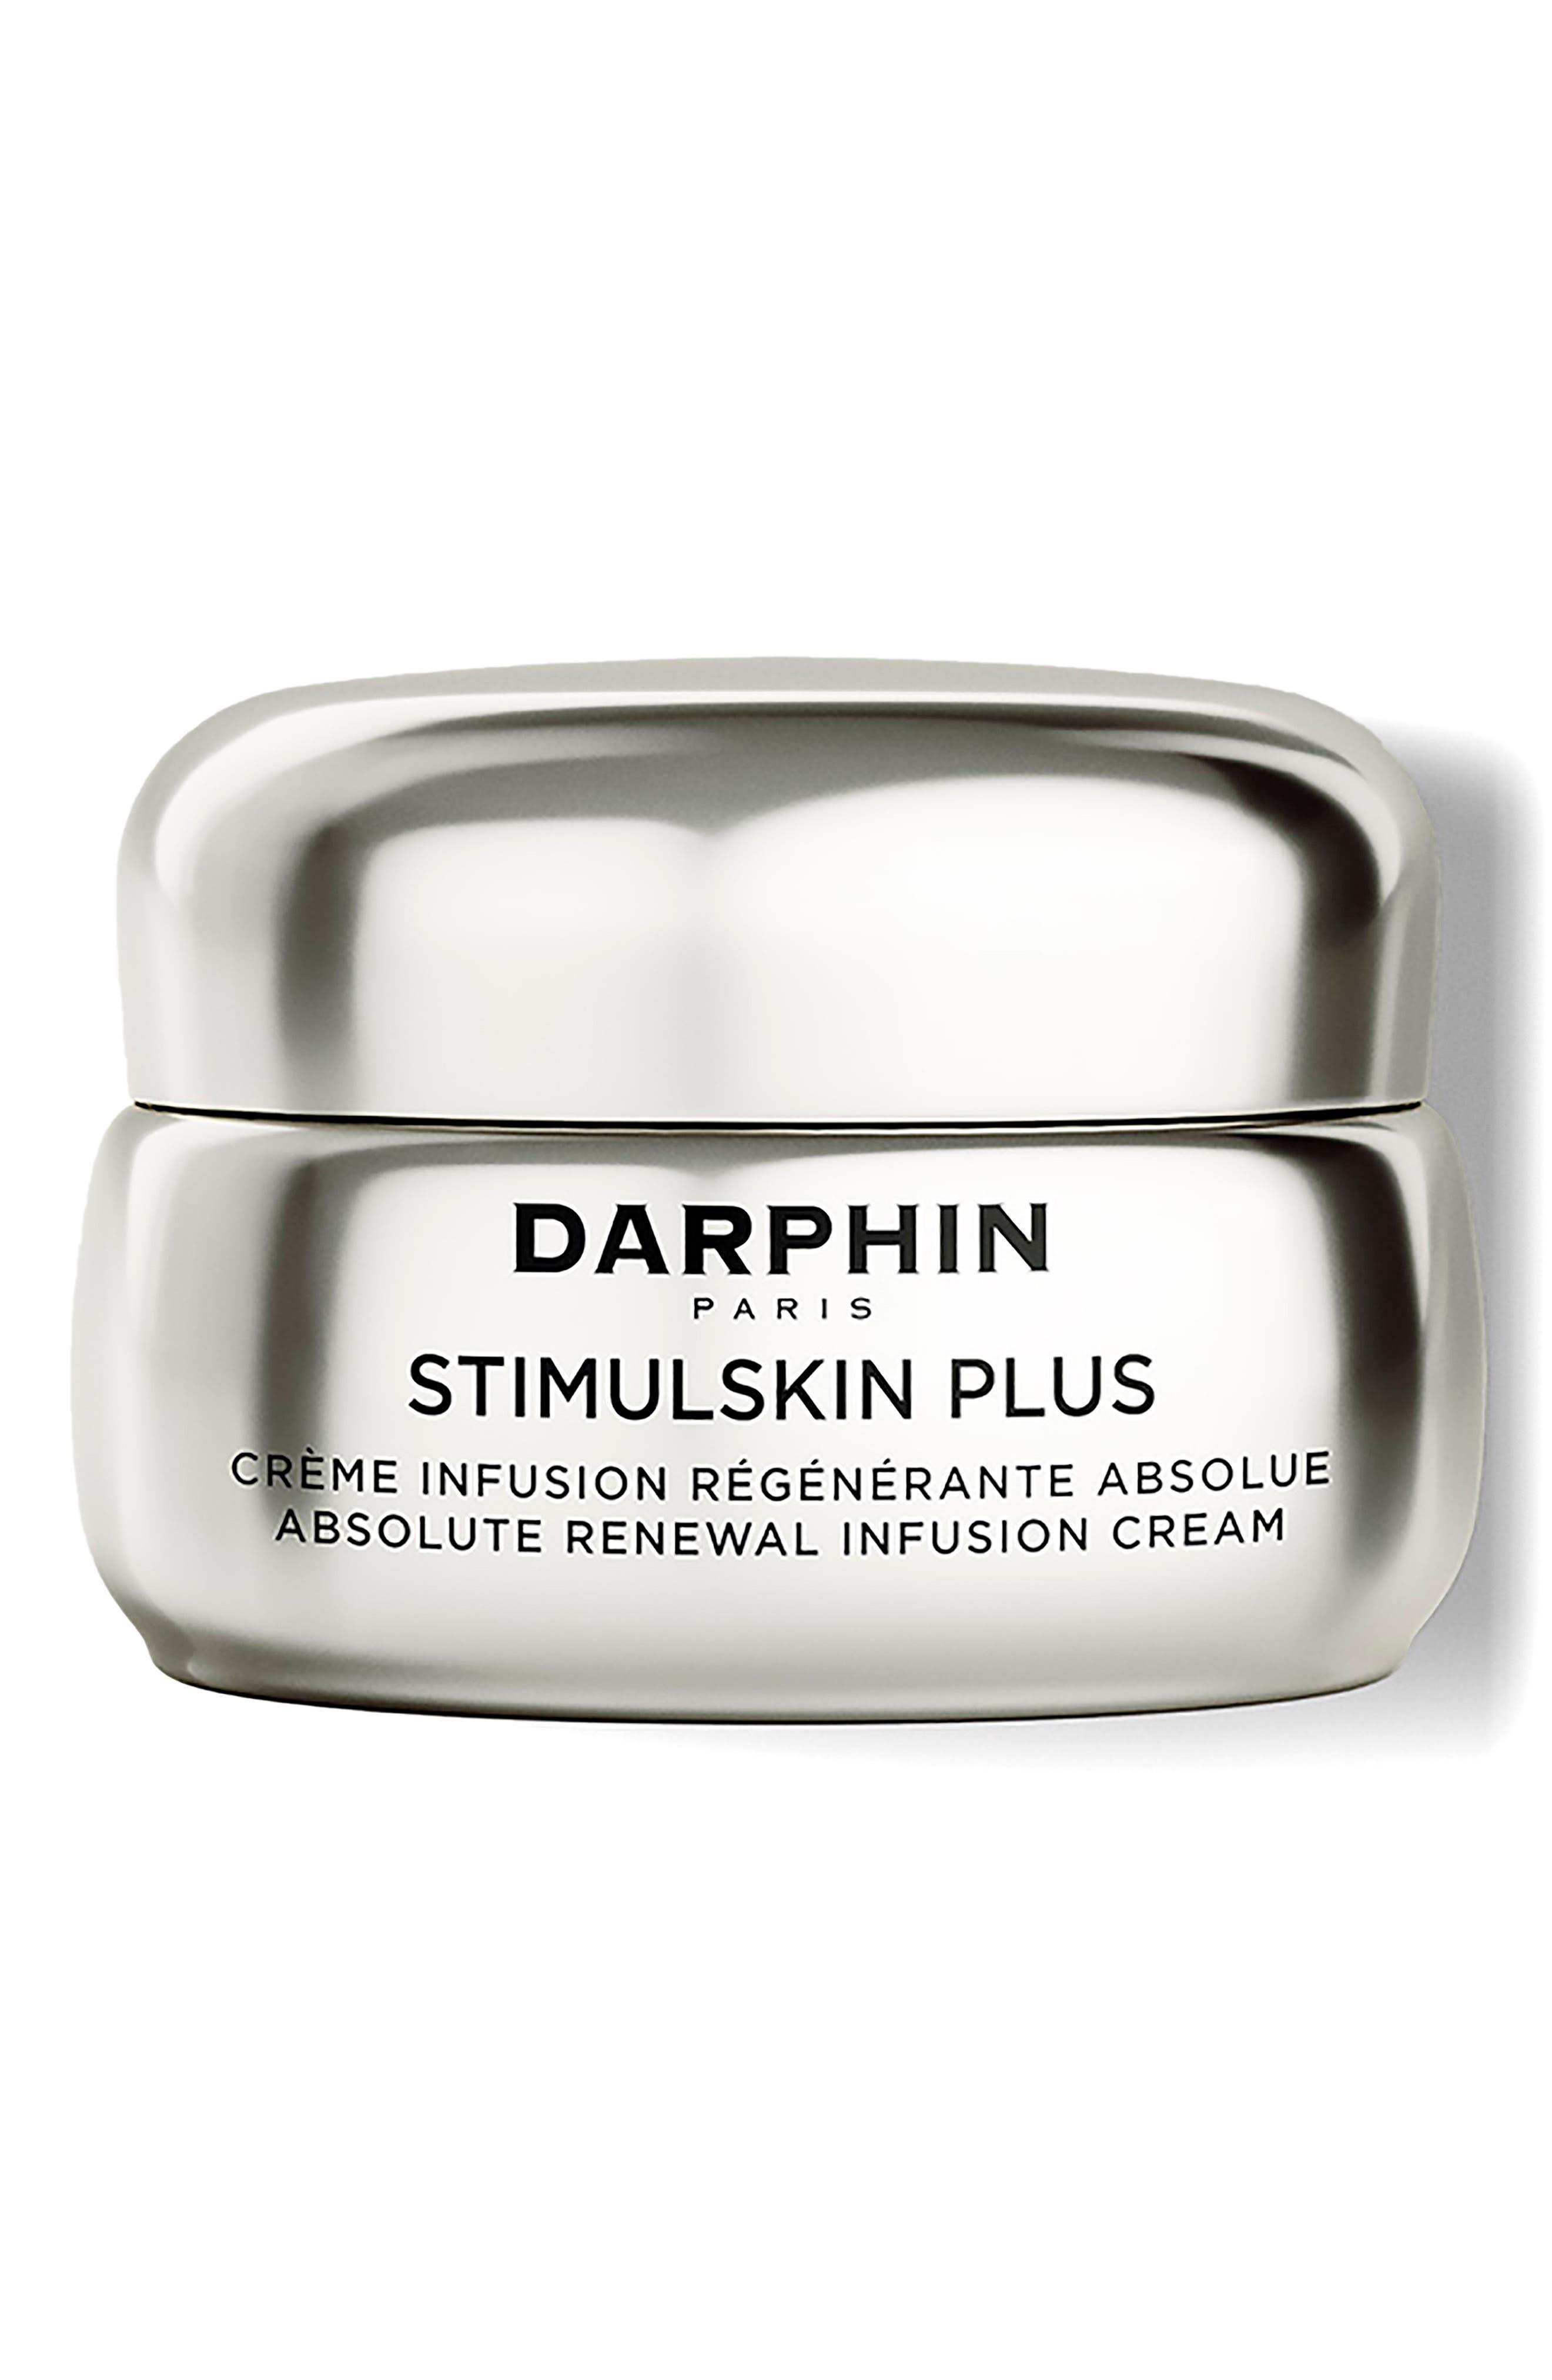 Stimulskin Plus Absolute Renewal Infusion Face Cream